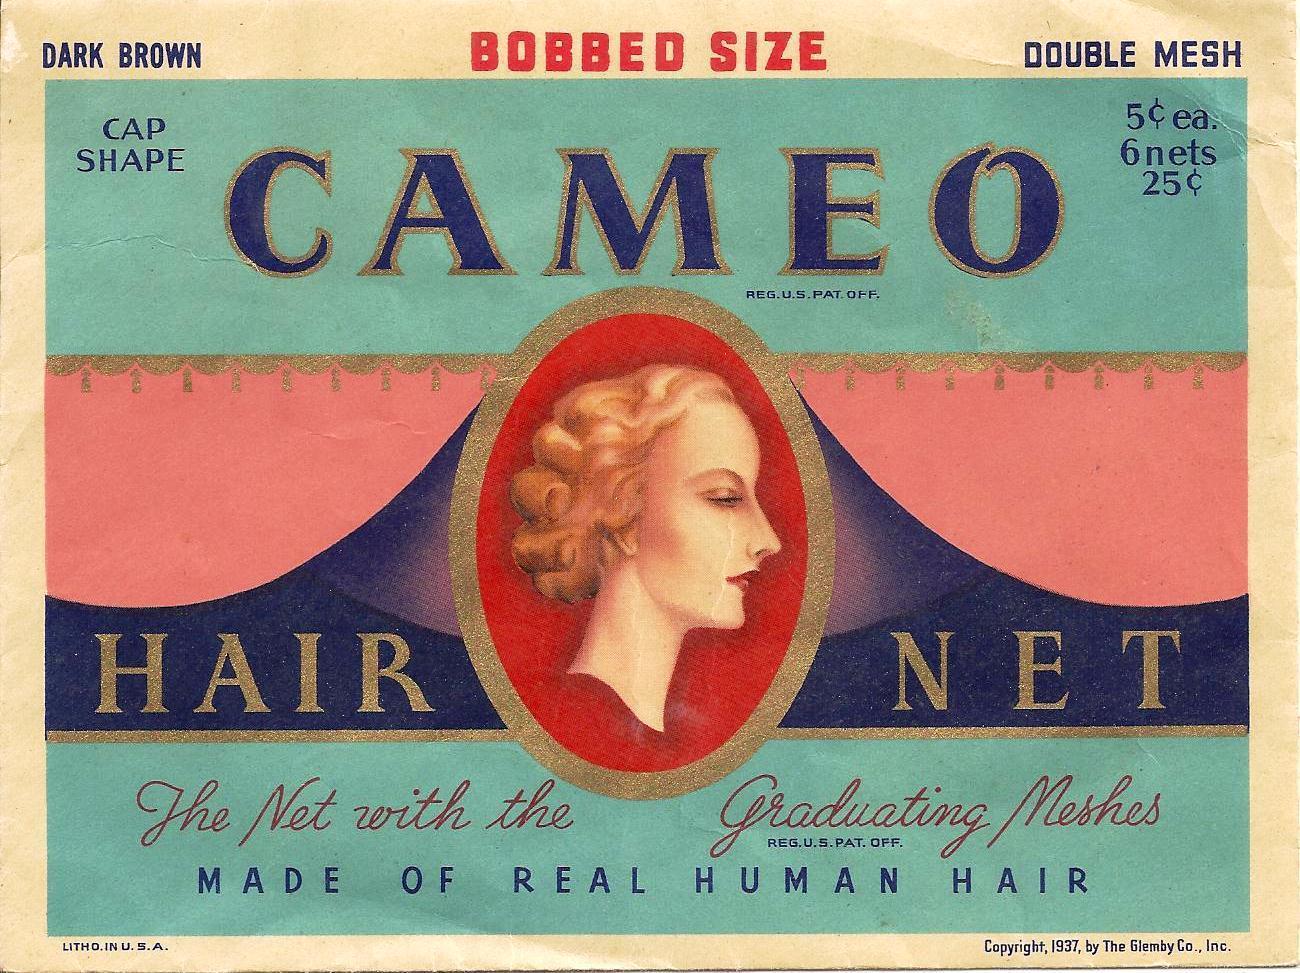 Pair Lot 1924 & 1937 Bobbed Hair Hair Net Envelopes  S.S. Kresge Co Vivid Color